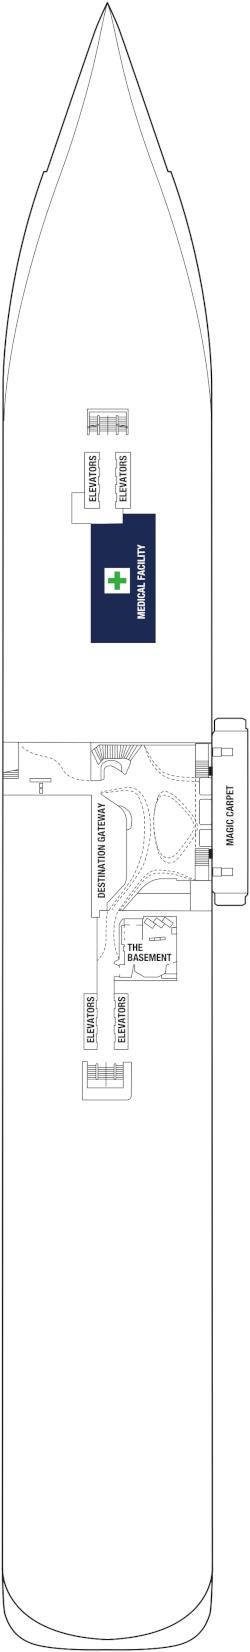 Celebrity Apex Deck Two Deck Plan